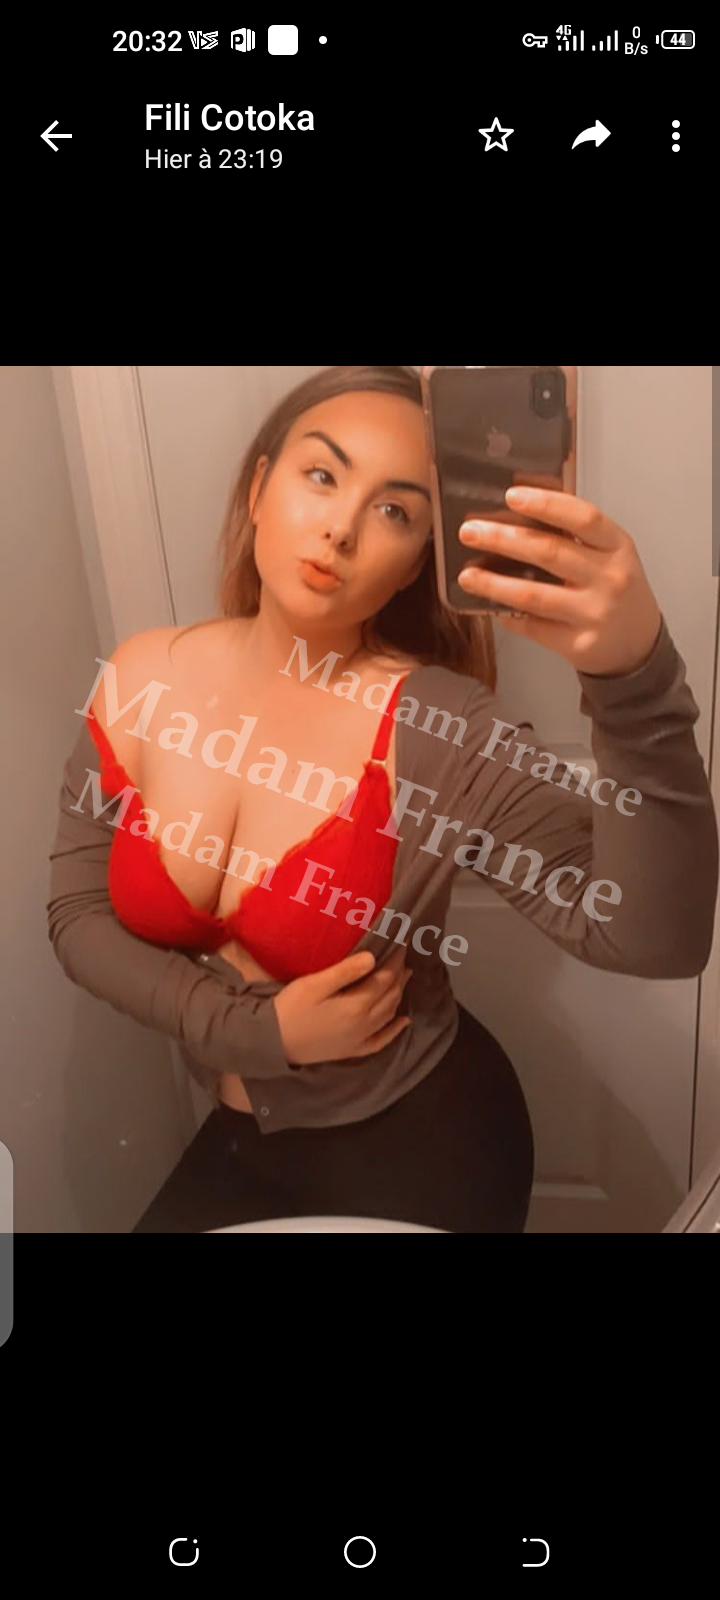 Maria model on Madam France escort service